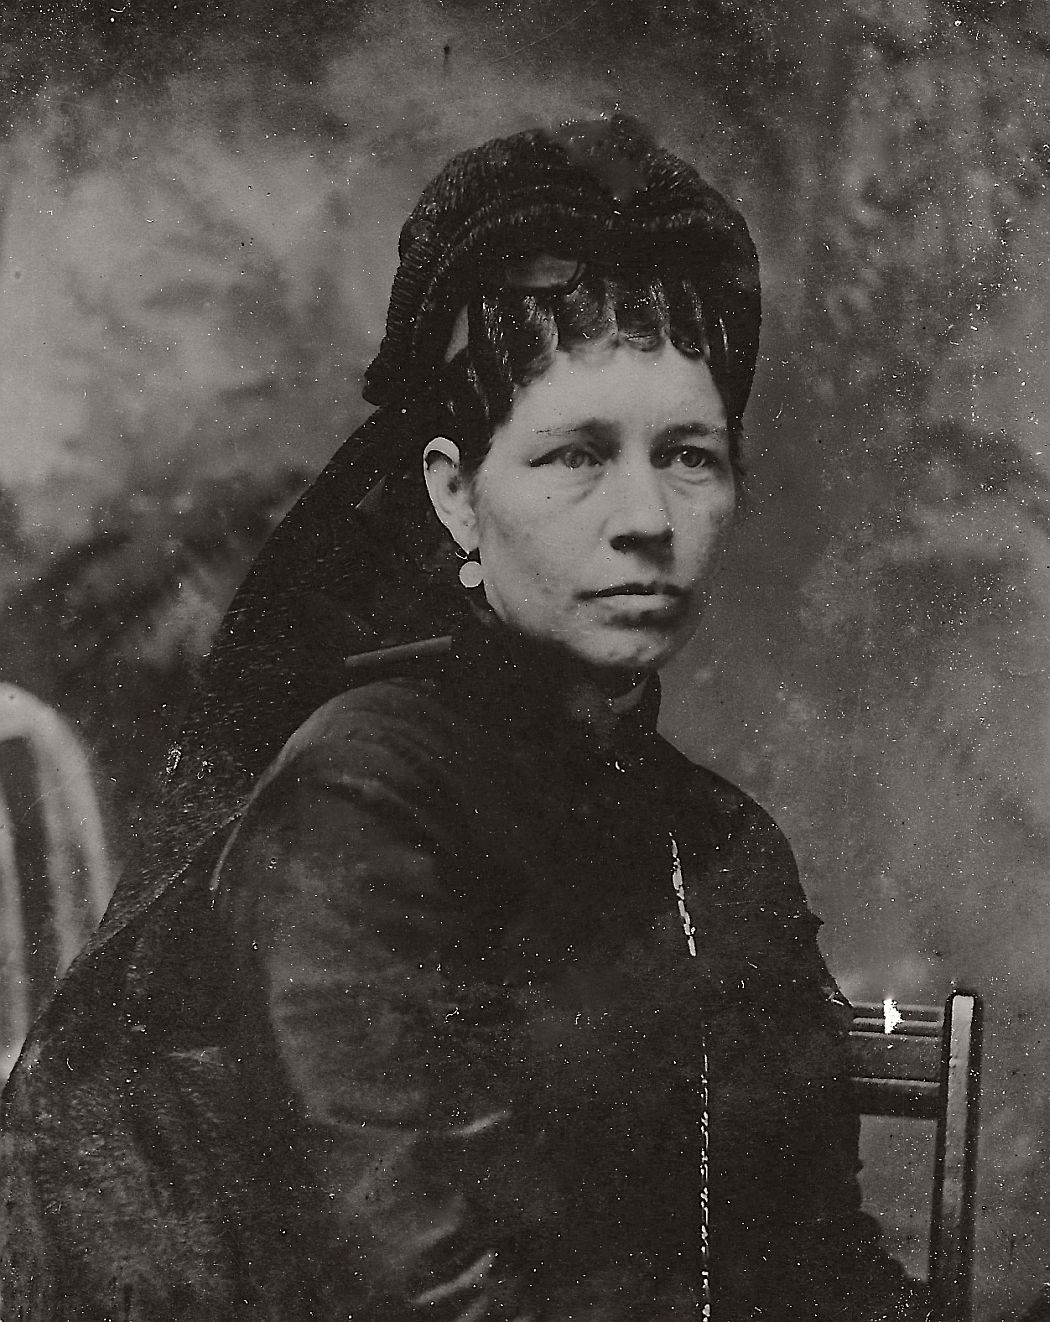 vintage-daguerreotypes-of-widows-in-mourning-victorian-era-1800s-41